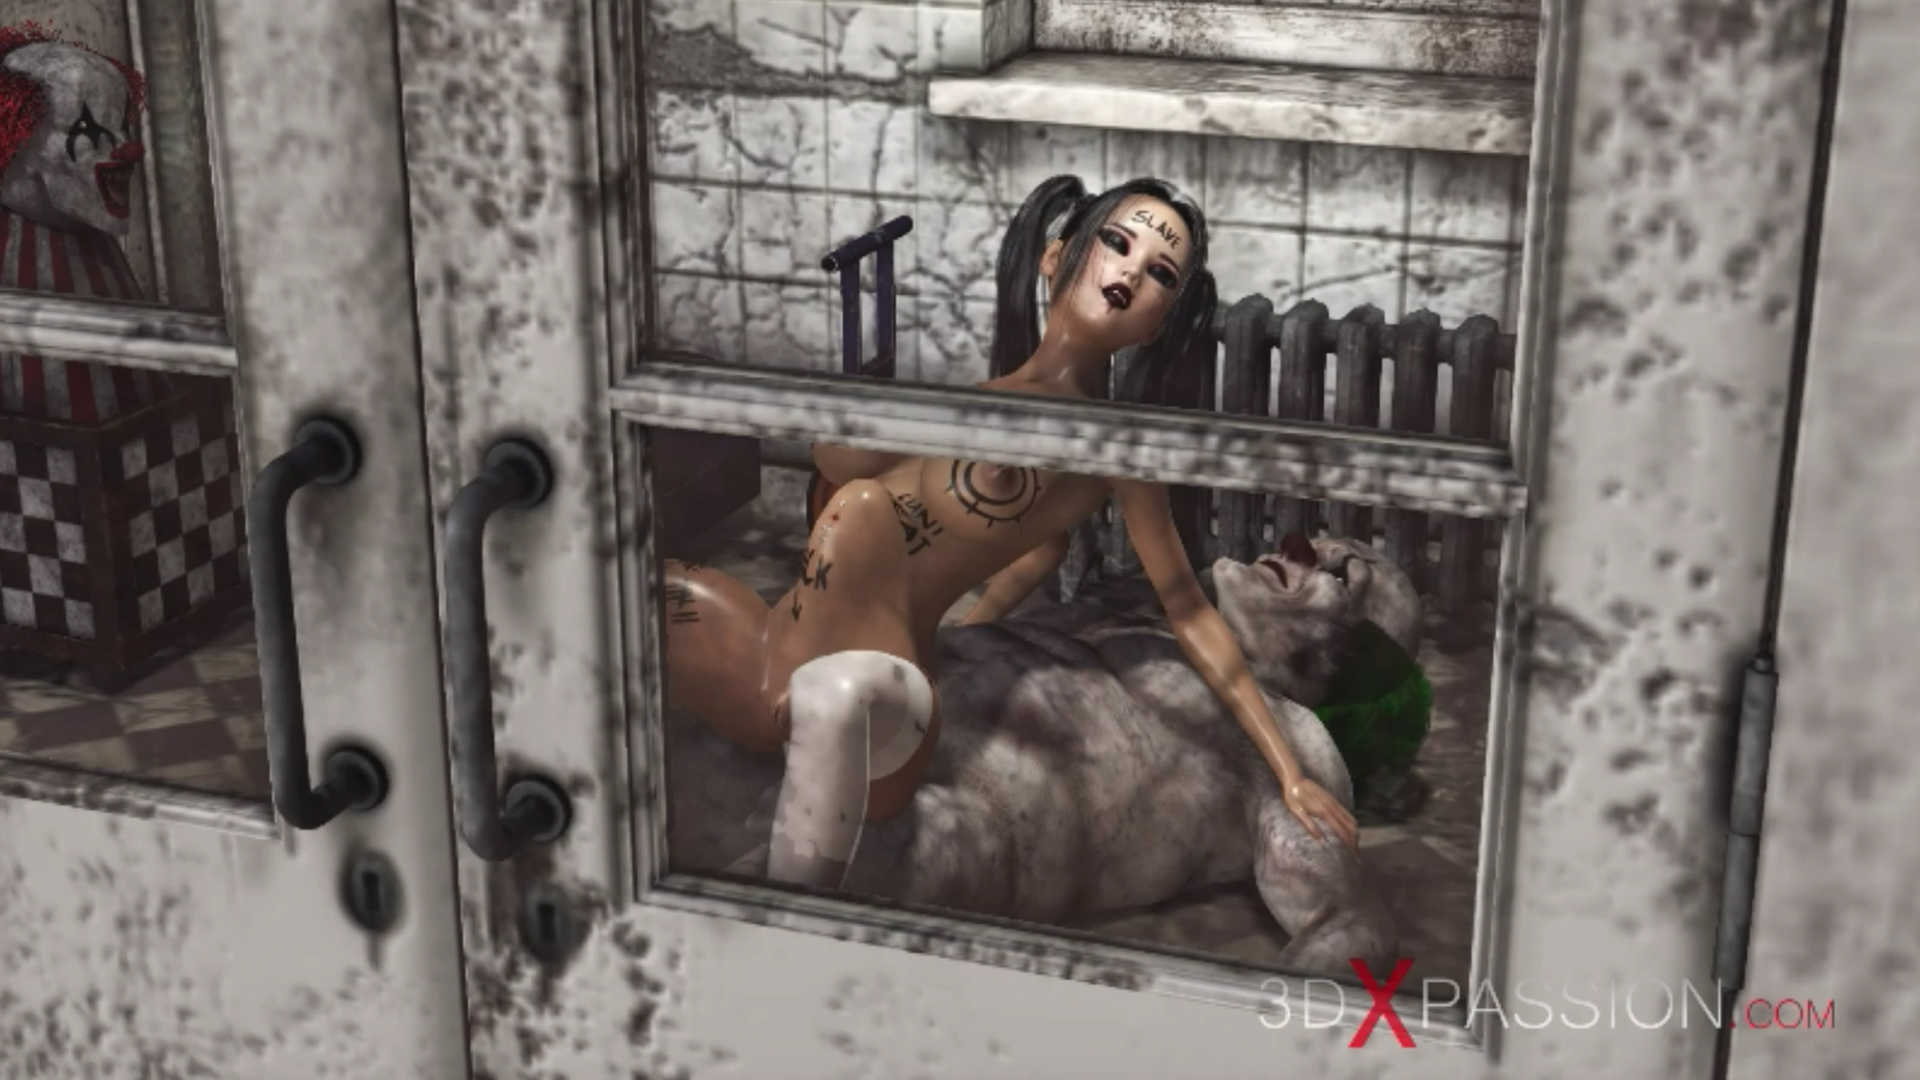 Evil clown reverse cowgirl schoolgirl abandoned hospital